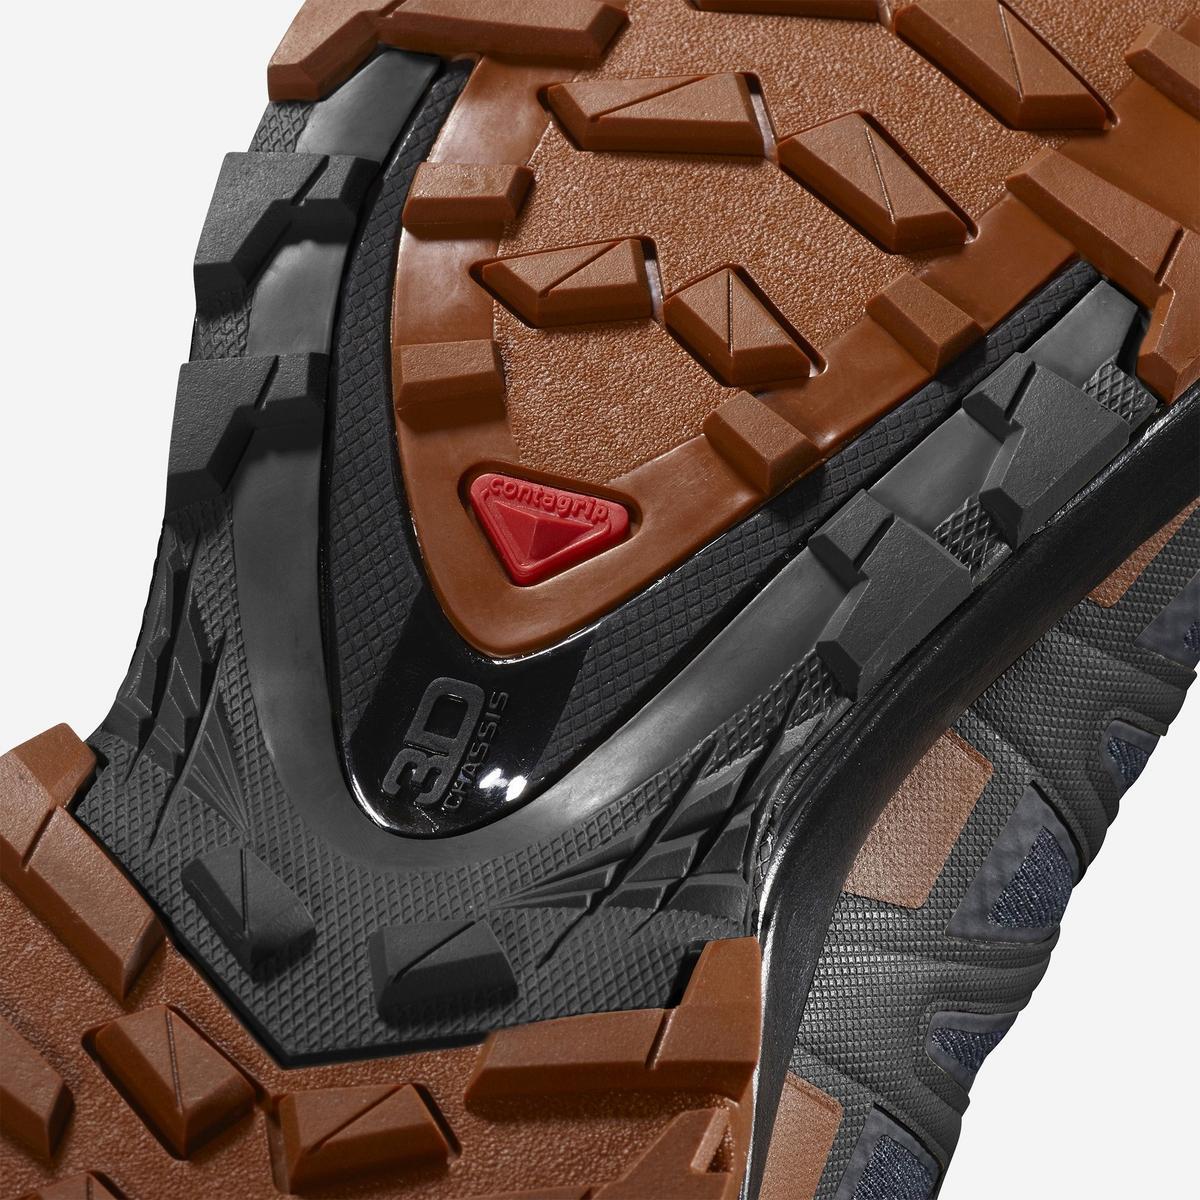 Salomon Men's XA Pro 3D V8 GTX - Caramel